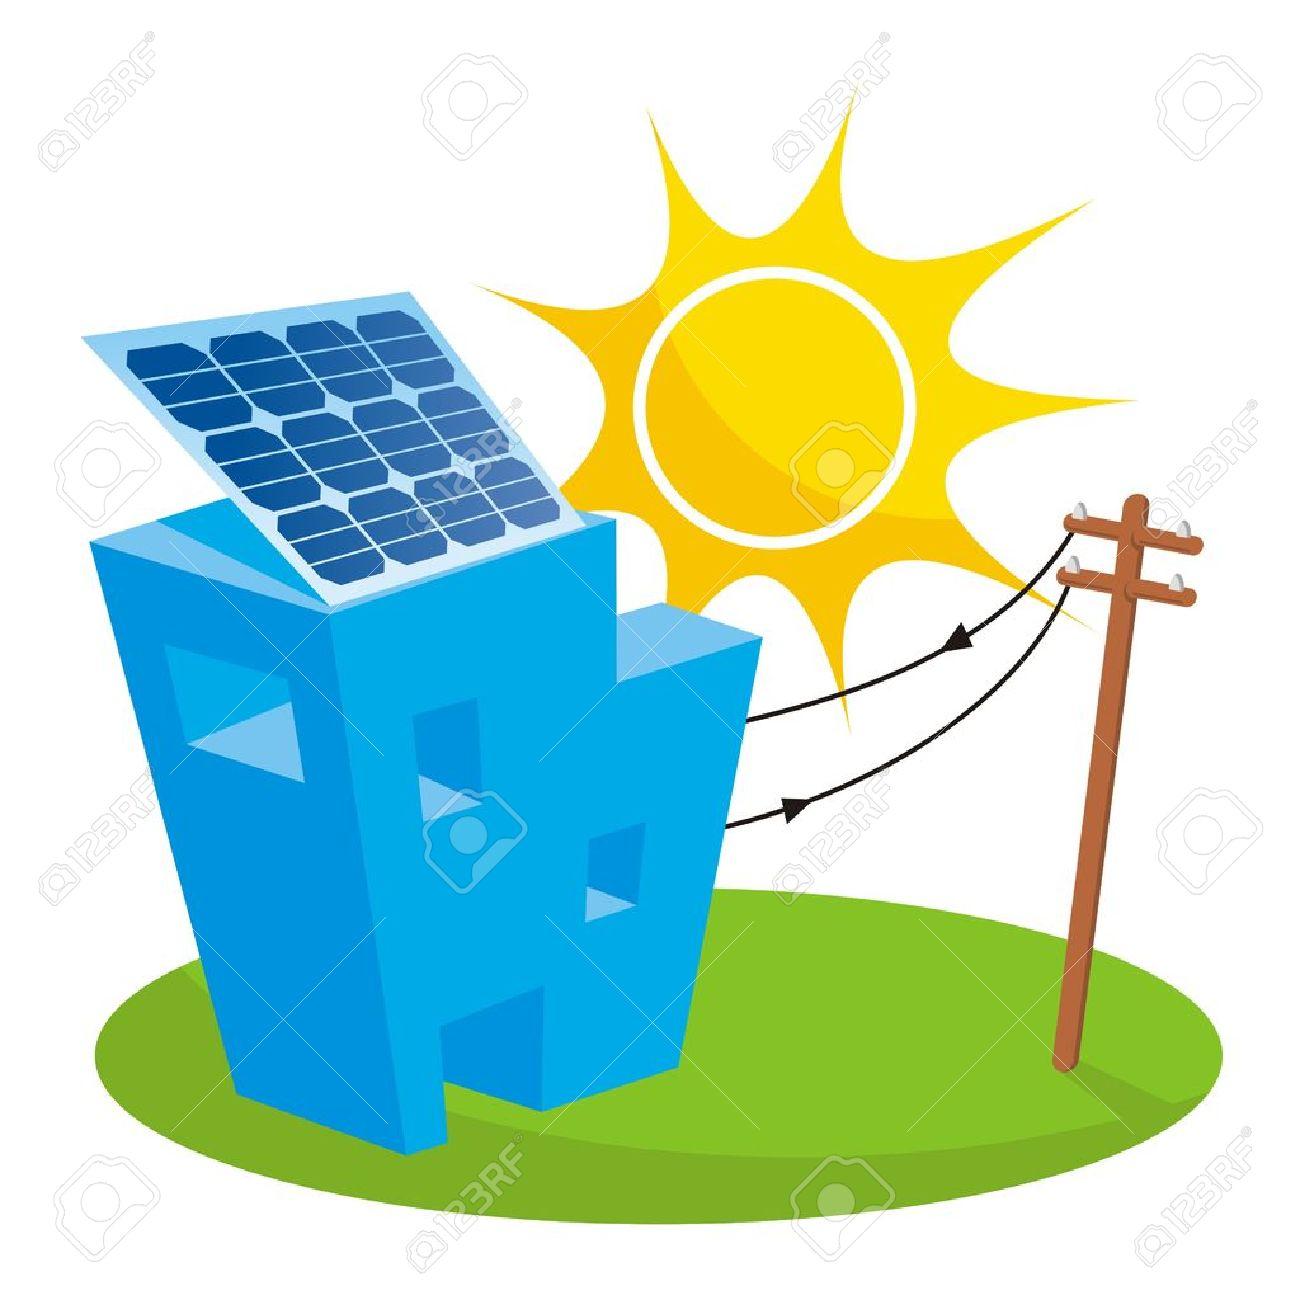 Clipart Electricity Pylon Electricity Pylon Solar